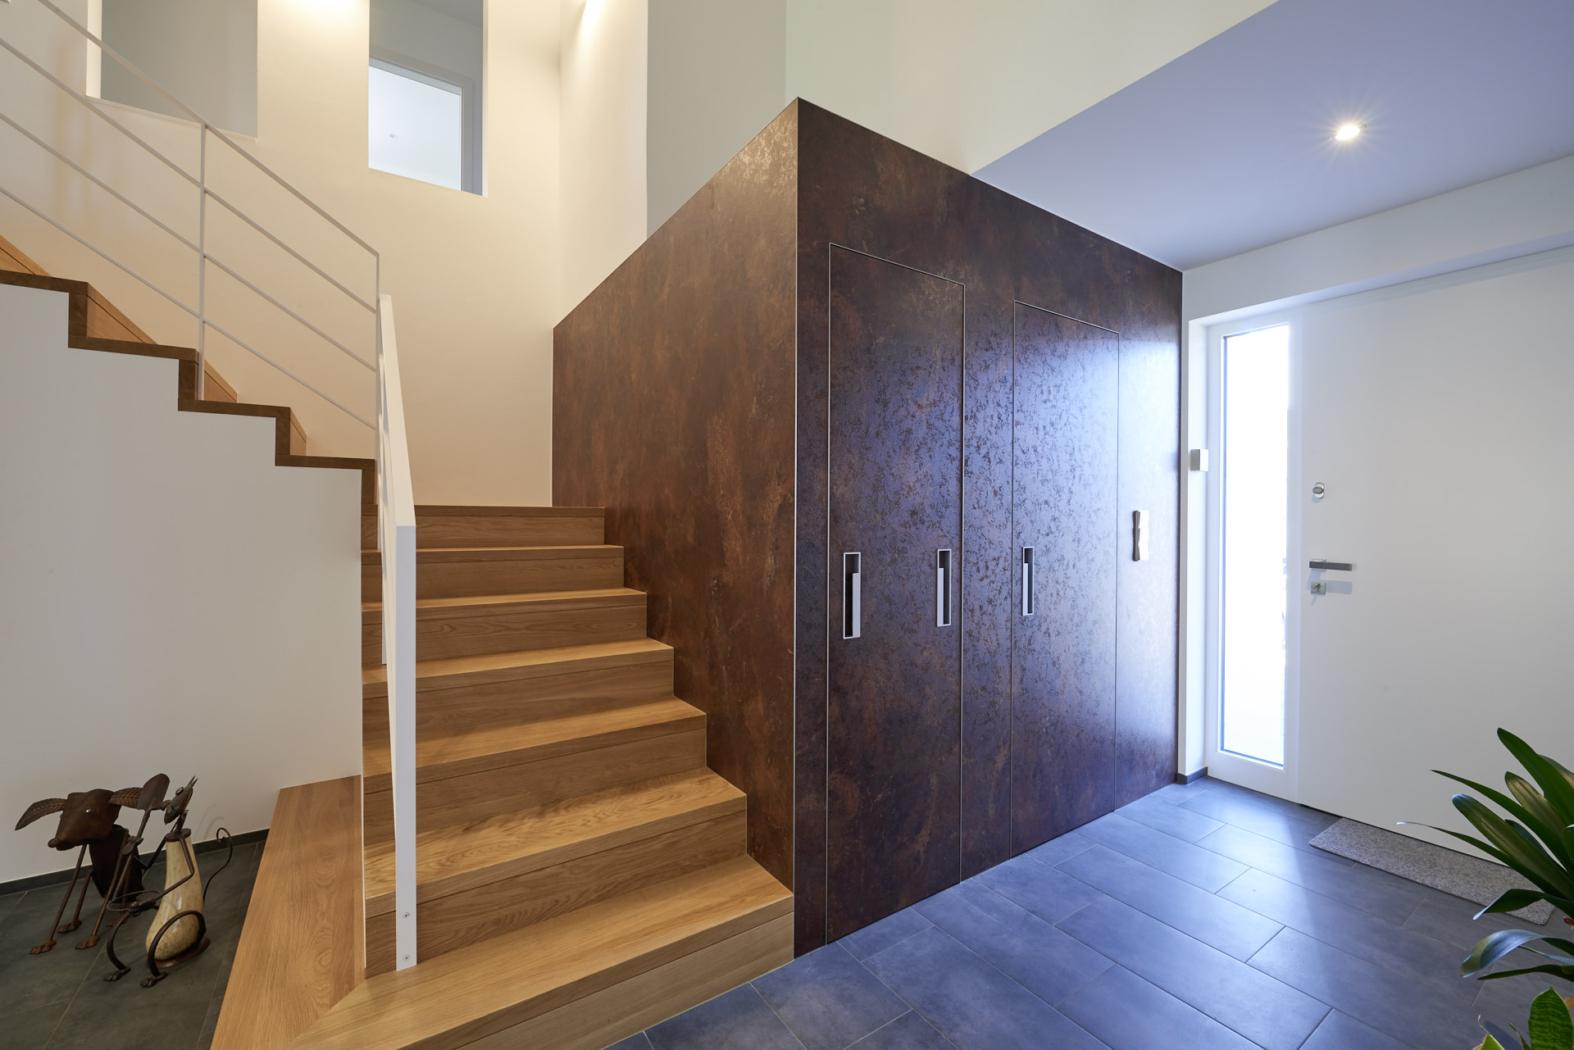 Berühmt Treppen l Eingangsbereich - Ardena MC05